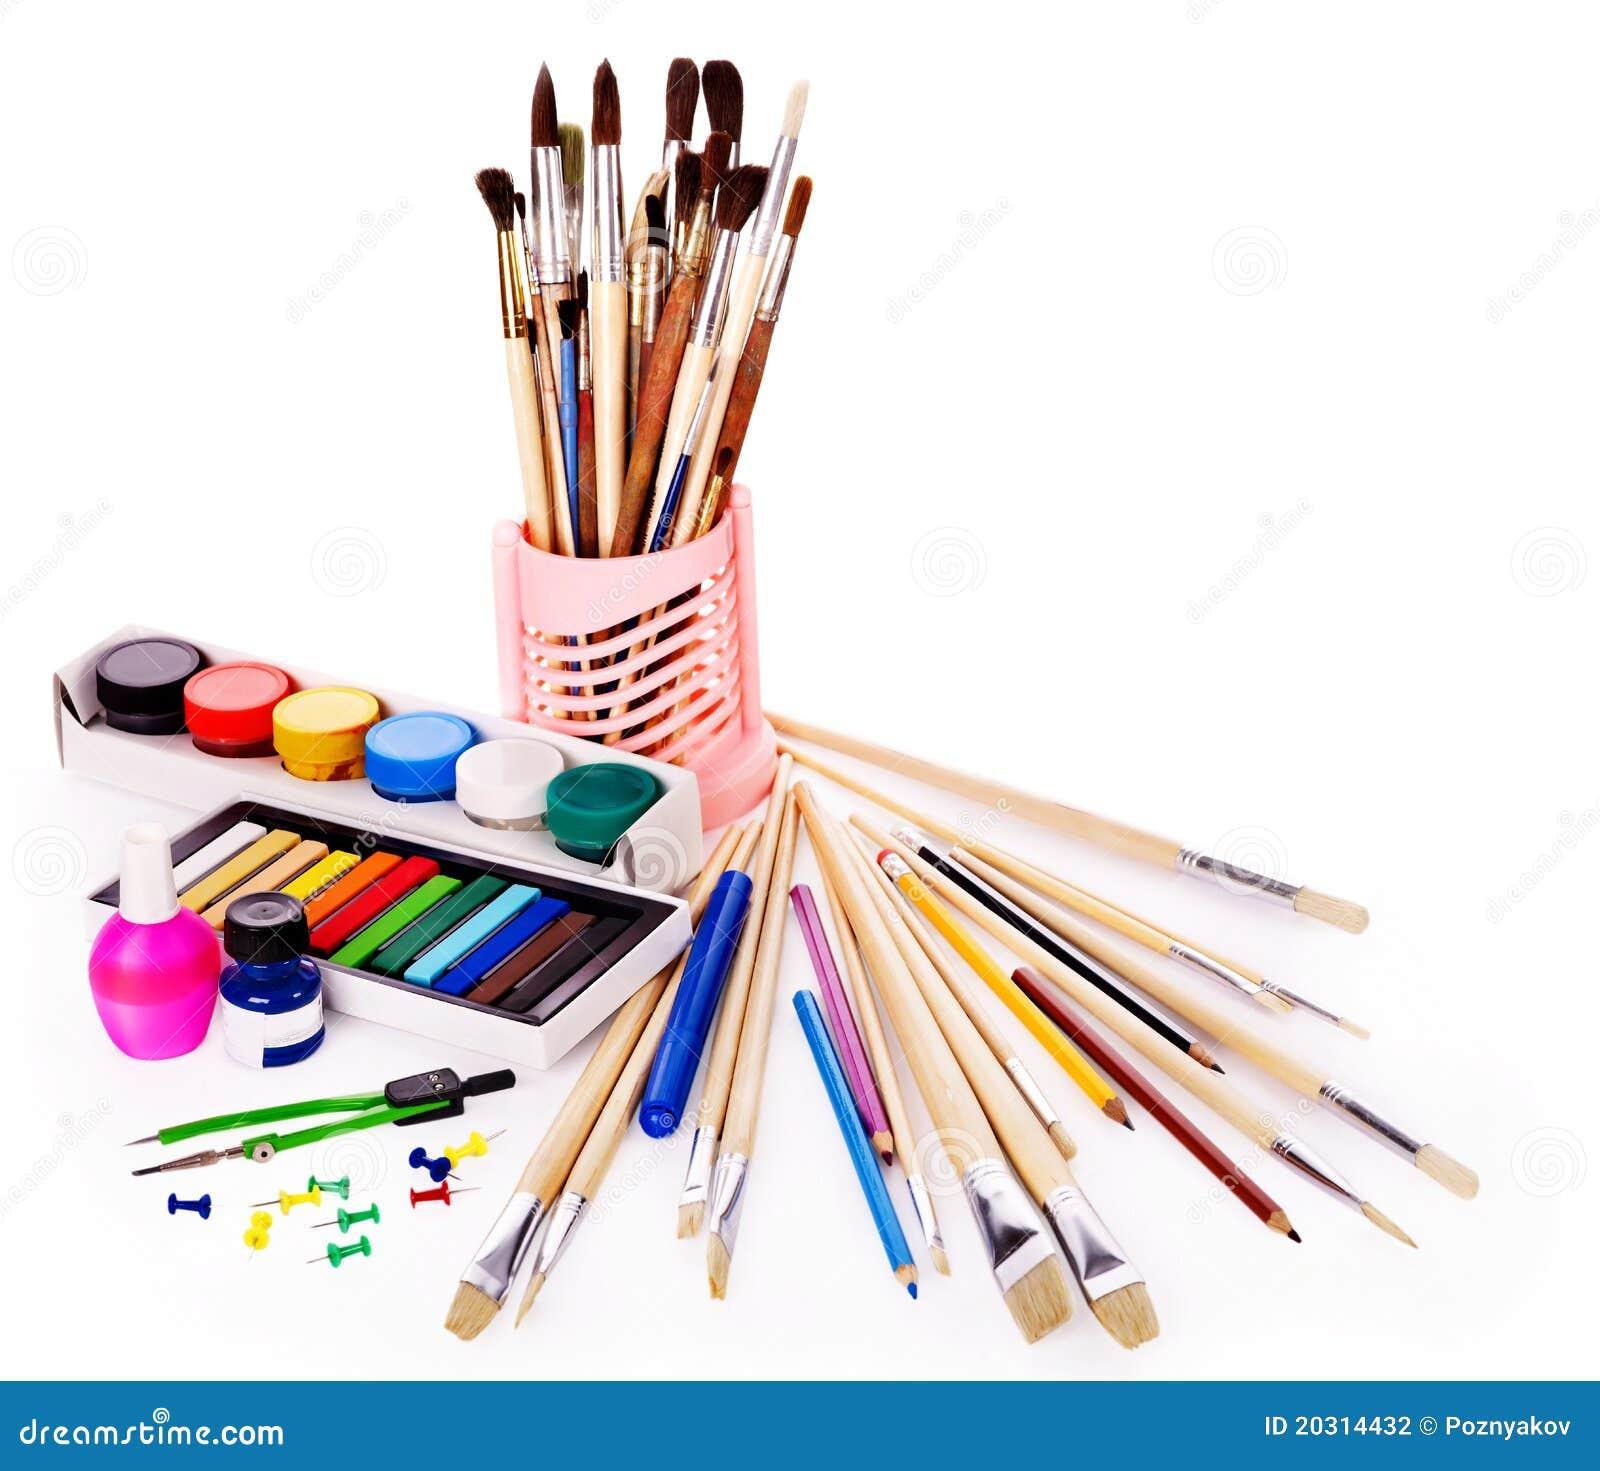 School Art Supplies Stock Photography Image 20314432